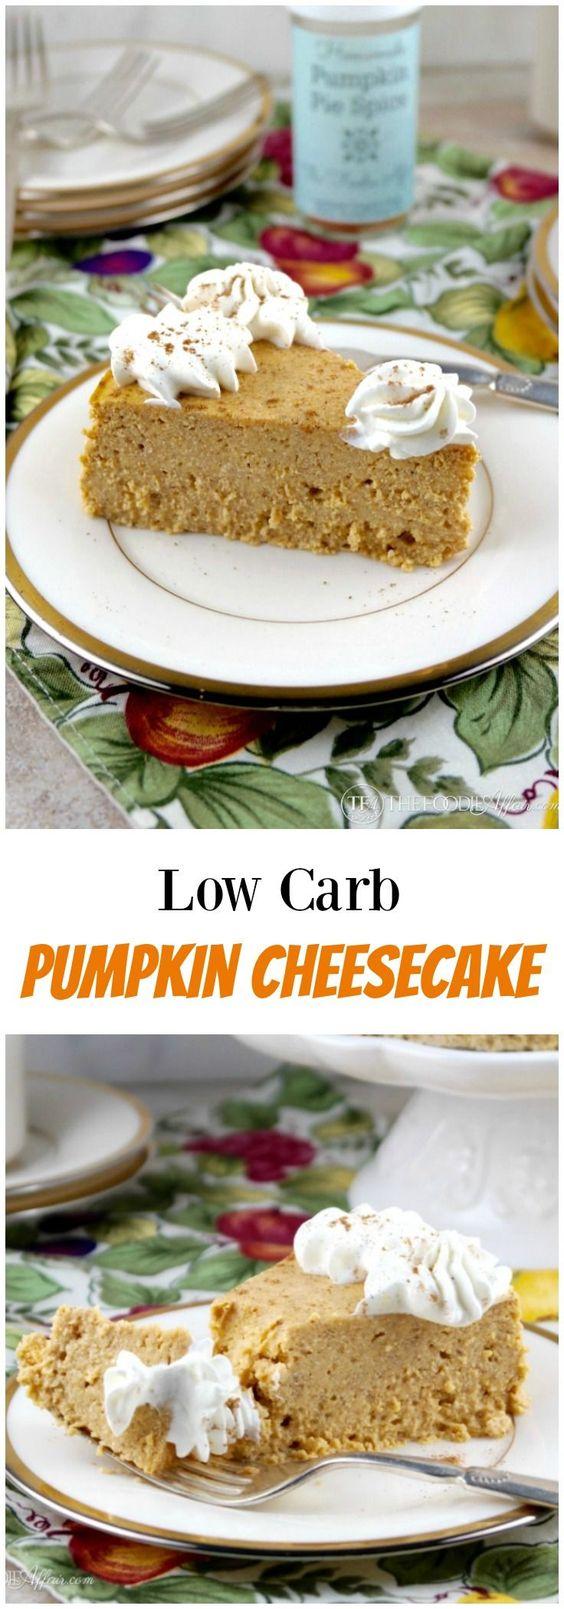 Pumpkin Cheesecake | Recipe | Low Carb Pumpkin Cheesecake, Pumpkin ...